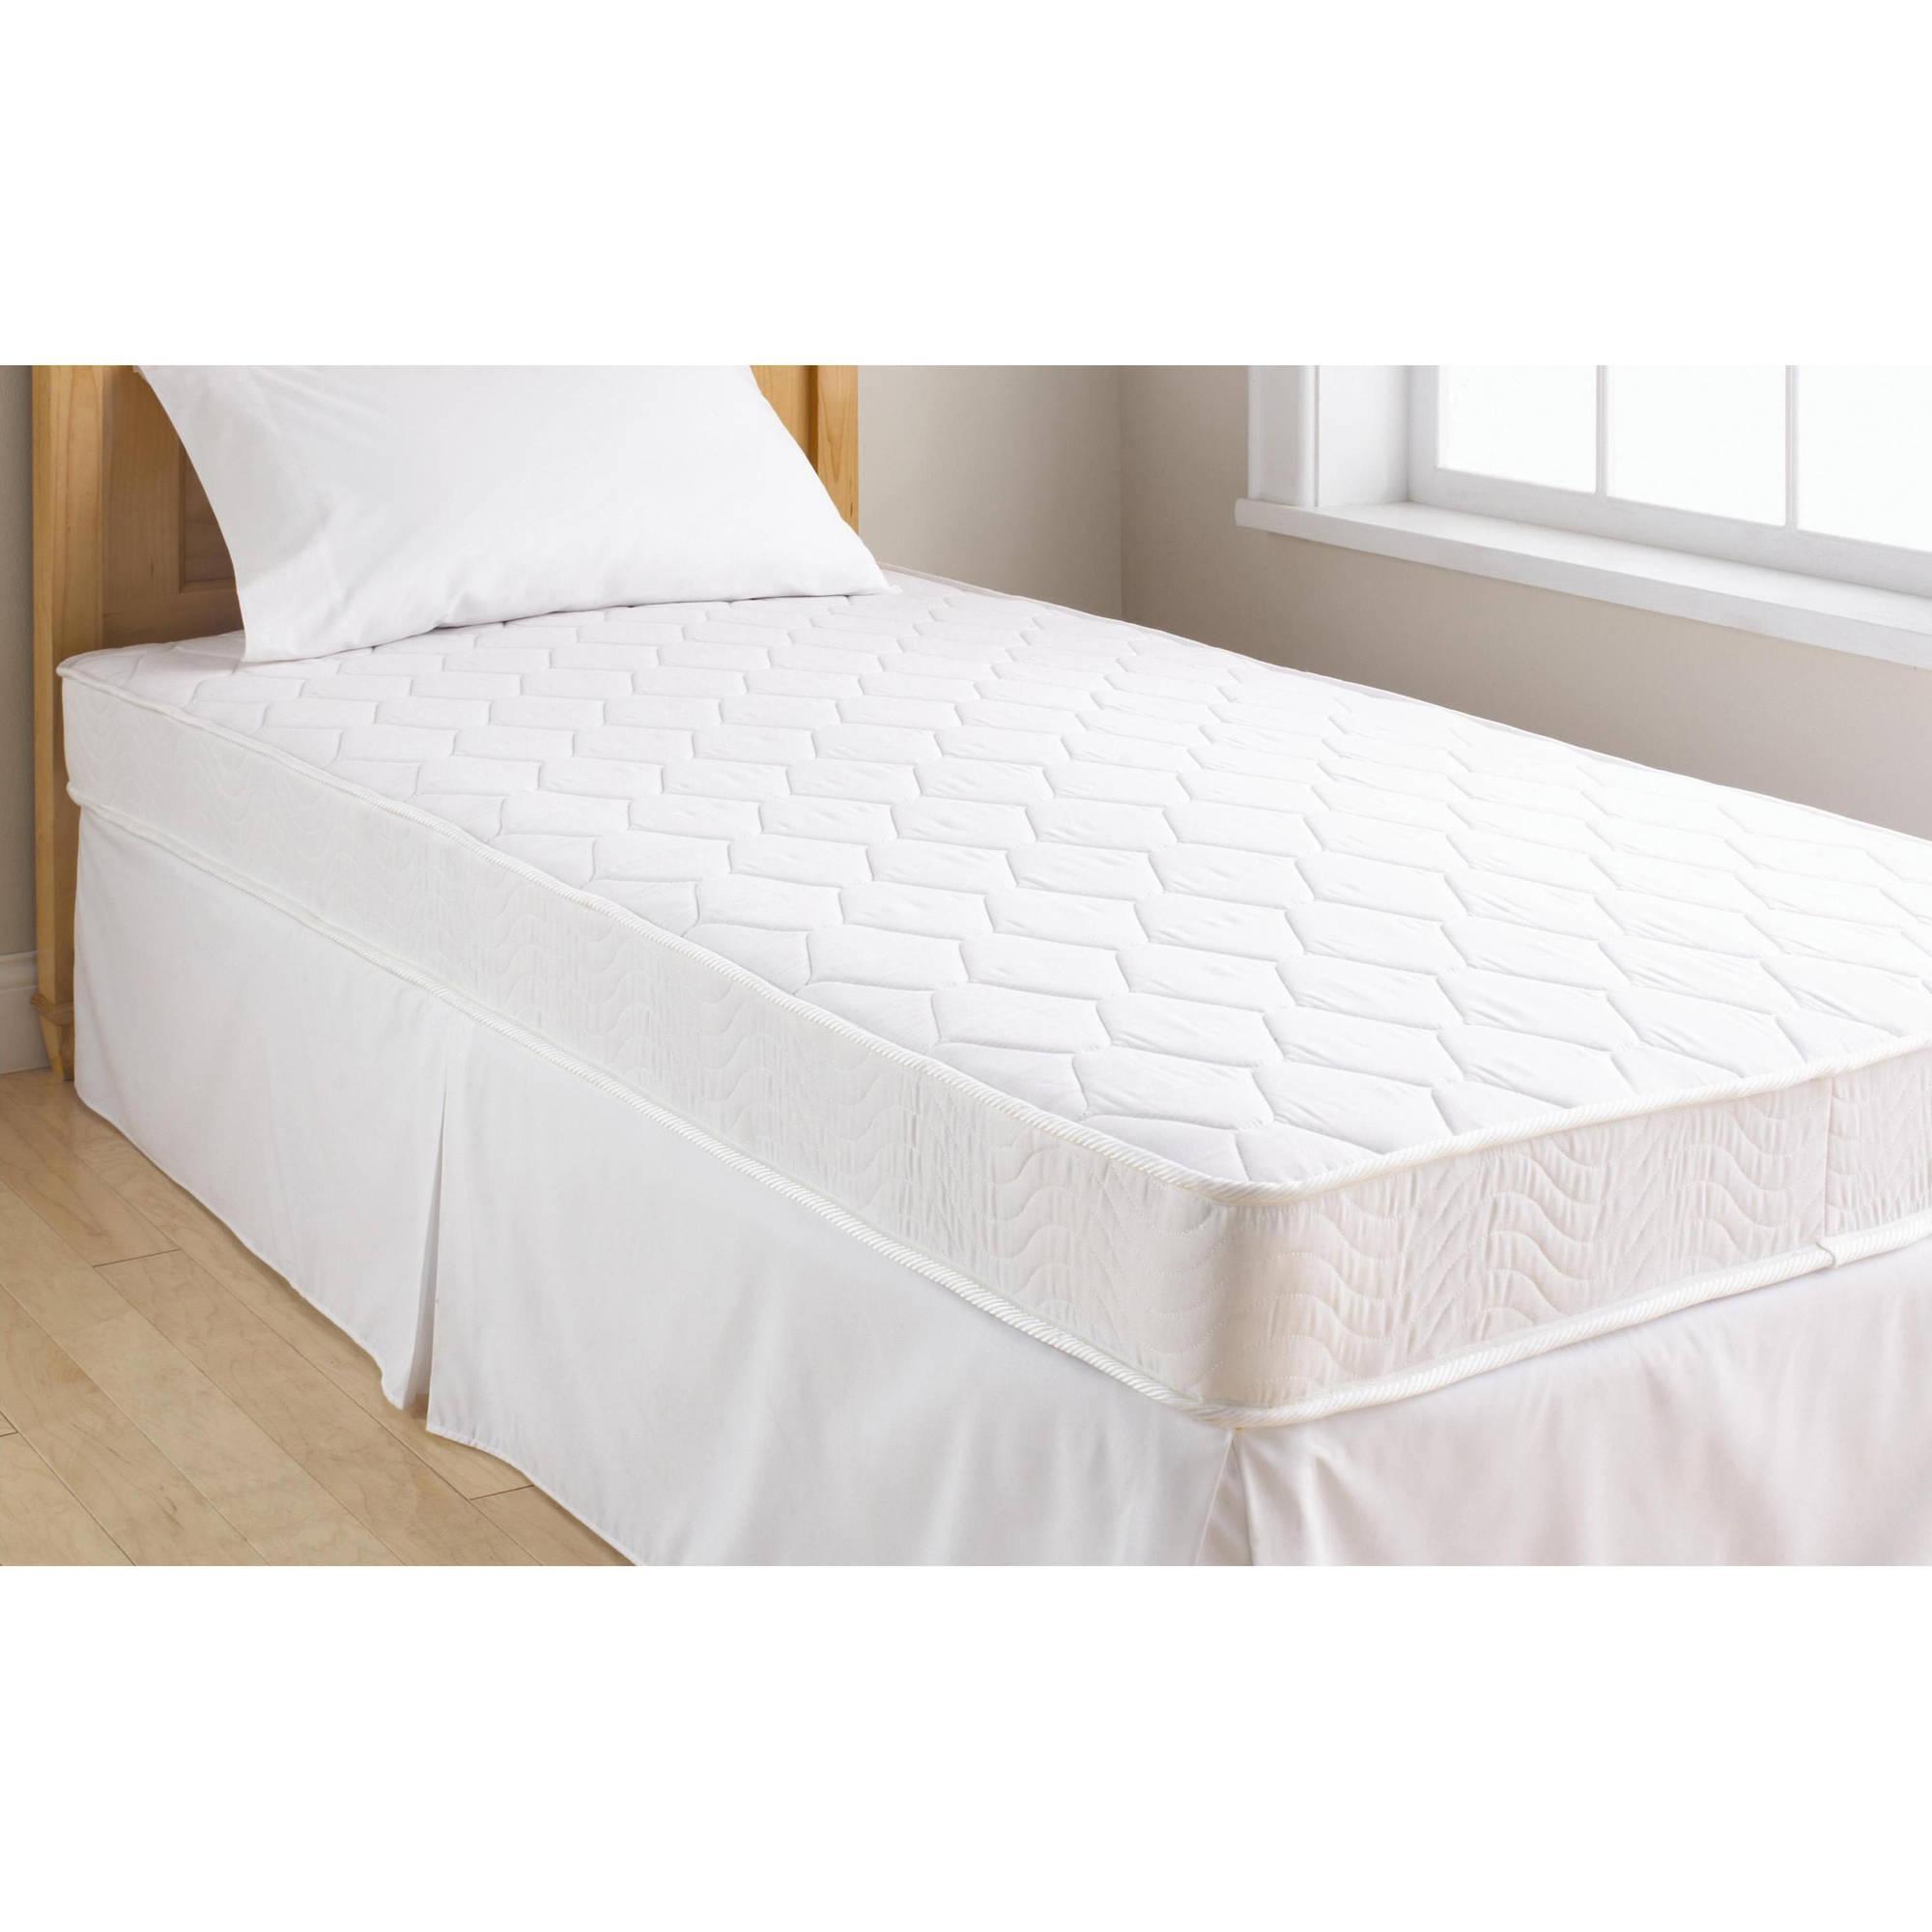 the size bed premier mattress sharper p src with inch full image foam com prod frame memory ostkcdn air